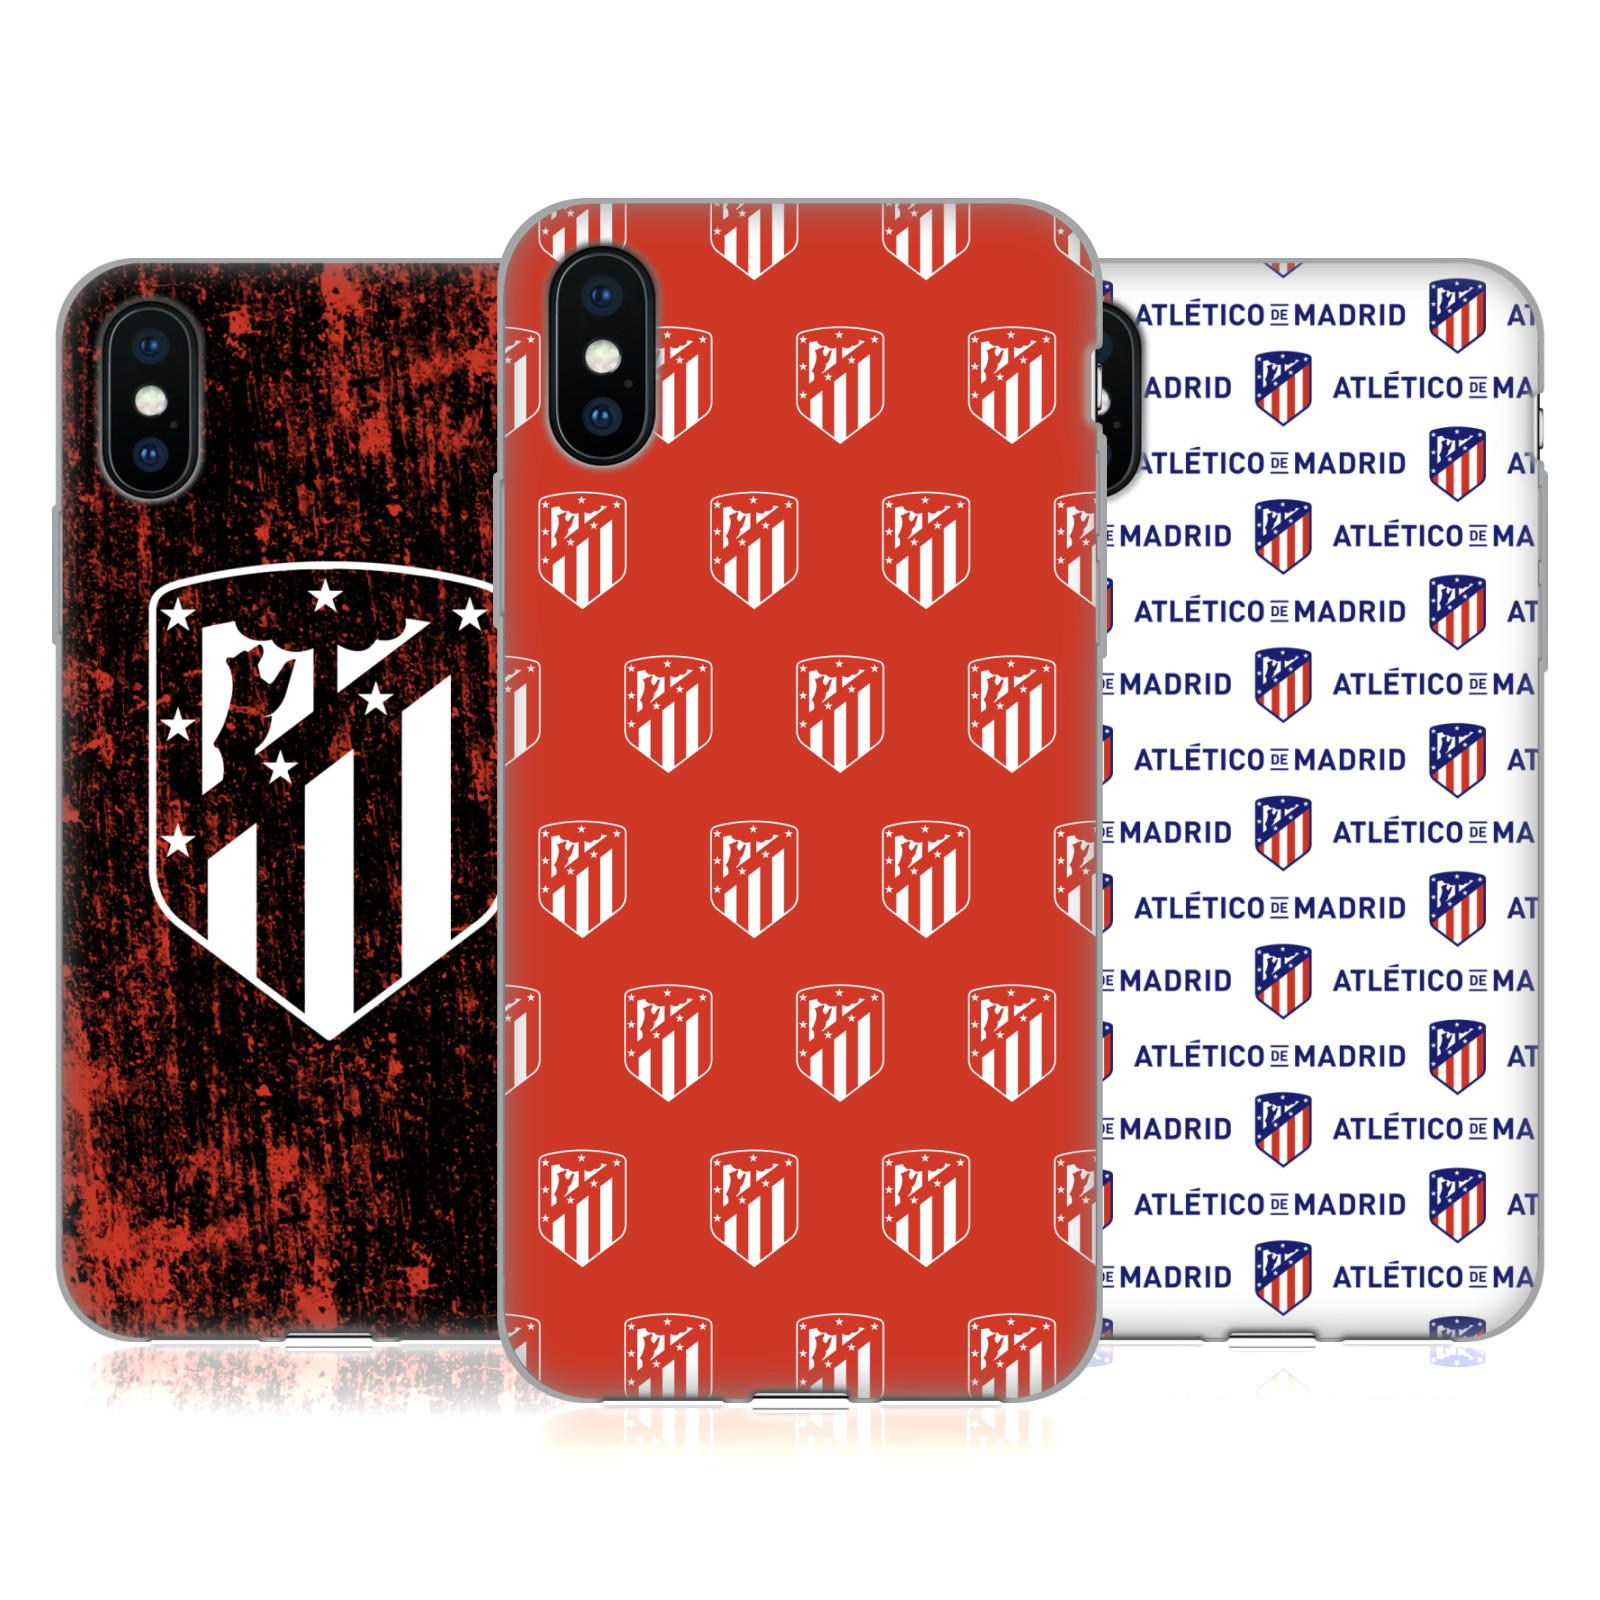 Atletico Madrid 2017/18 Crest Patterns